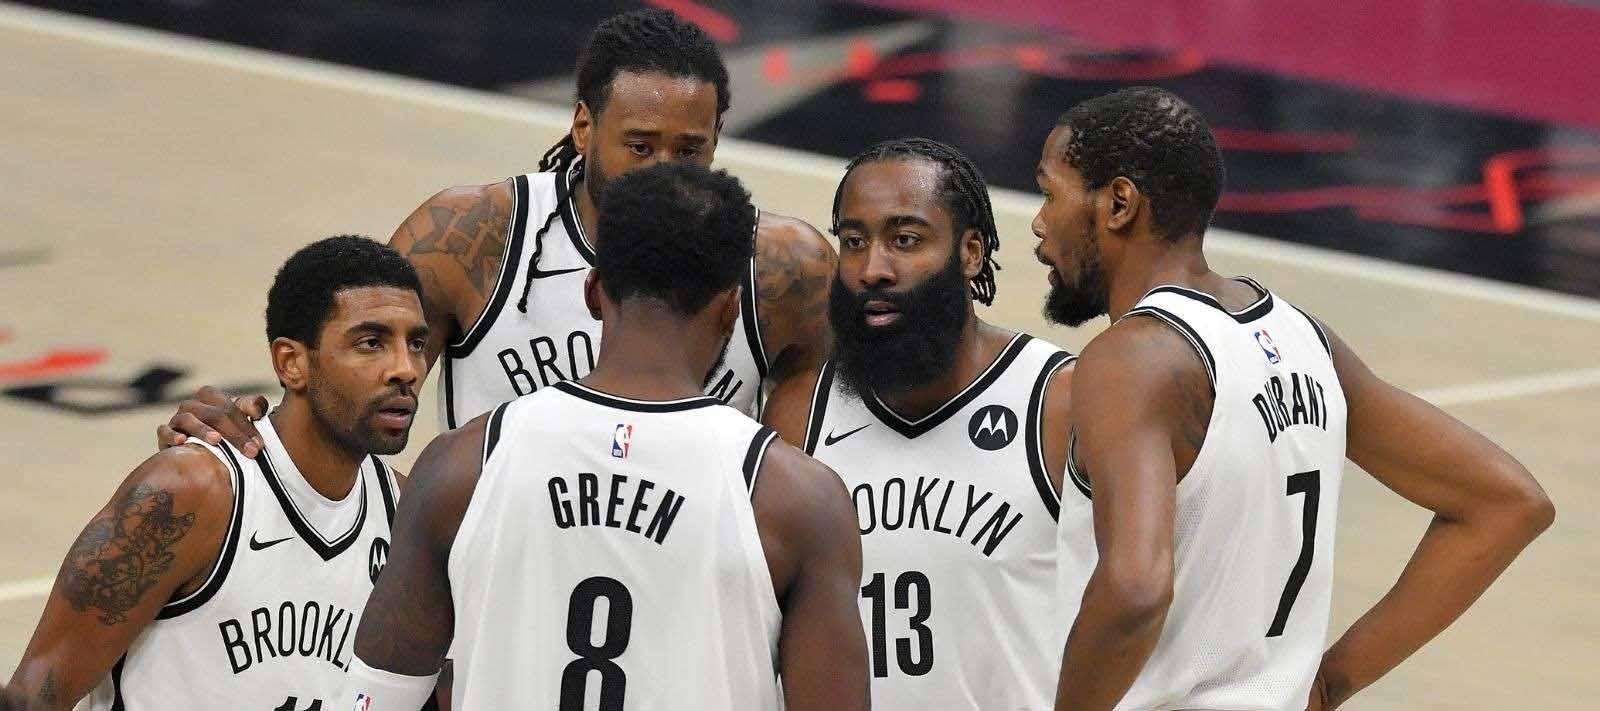 Nets vs Bucks Game 3